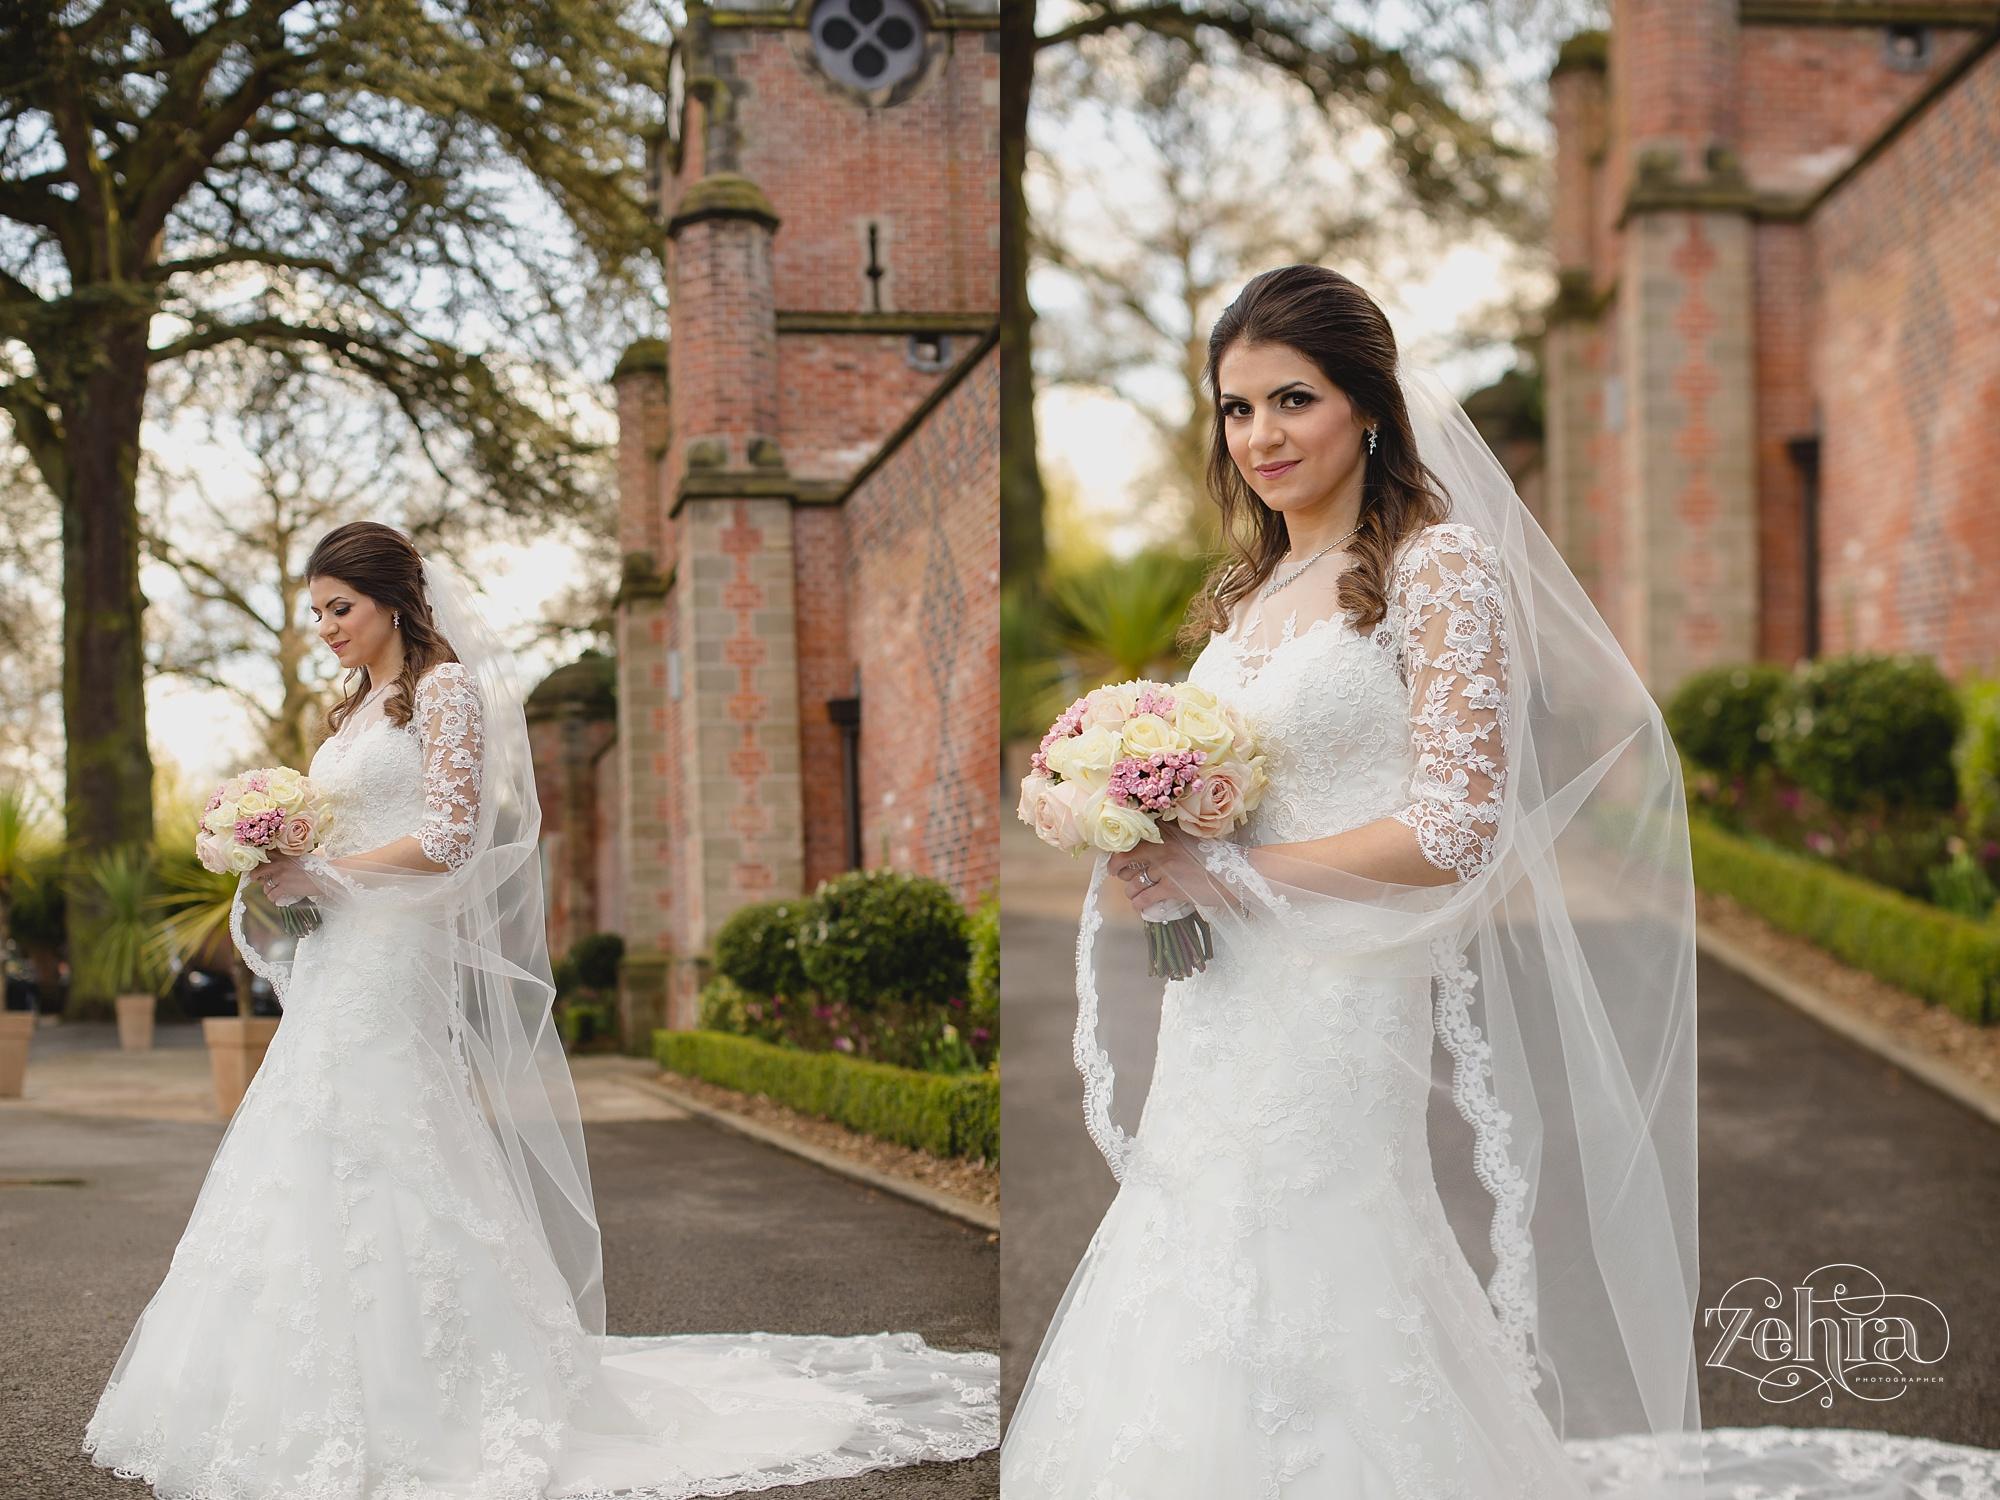 zehra photographer mere cheshire wedding_0024.jpg